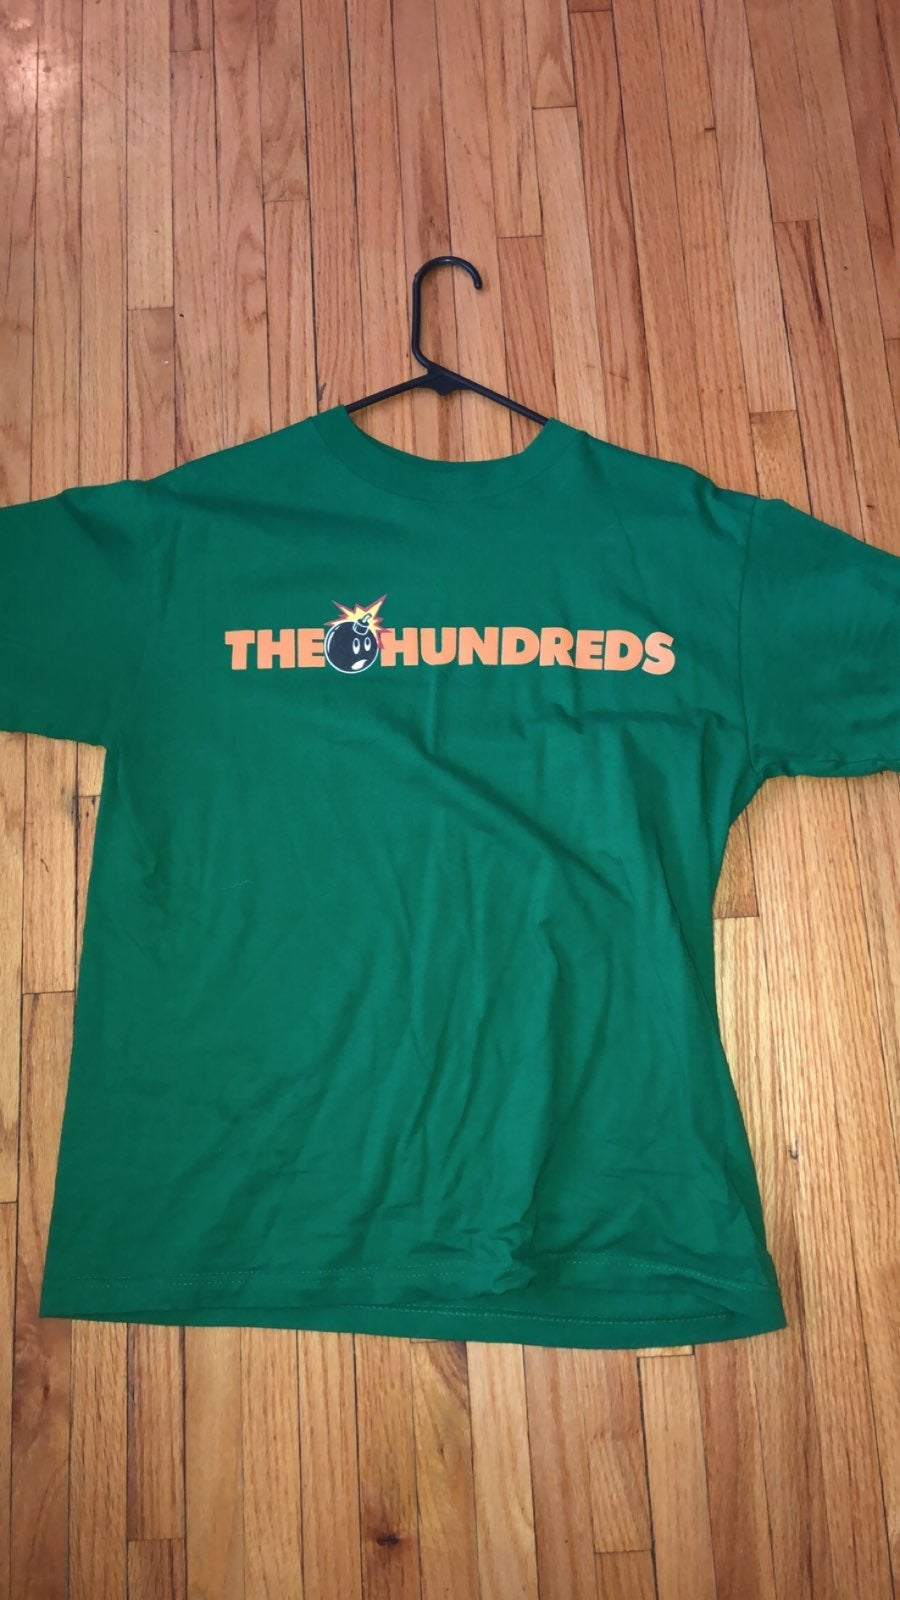 the hundreds shirt